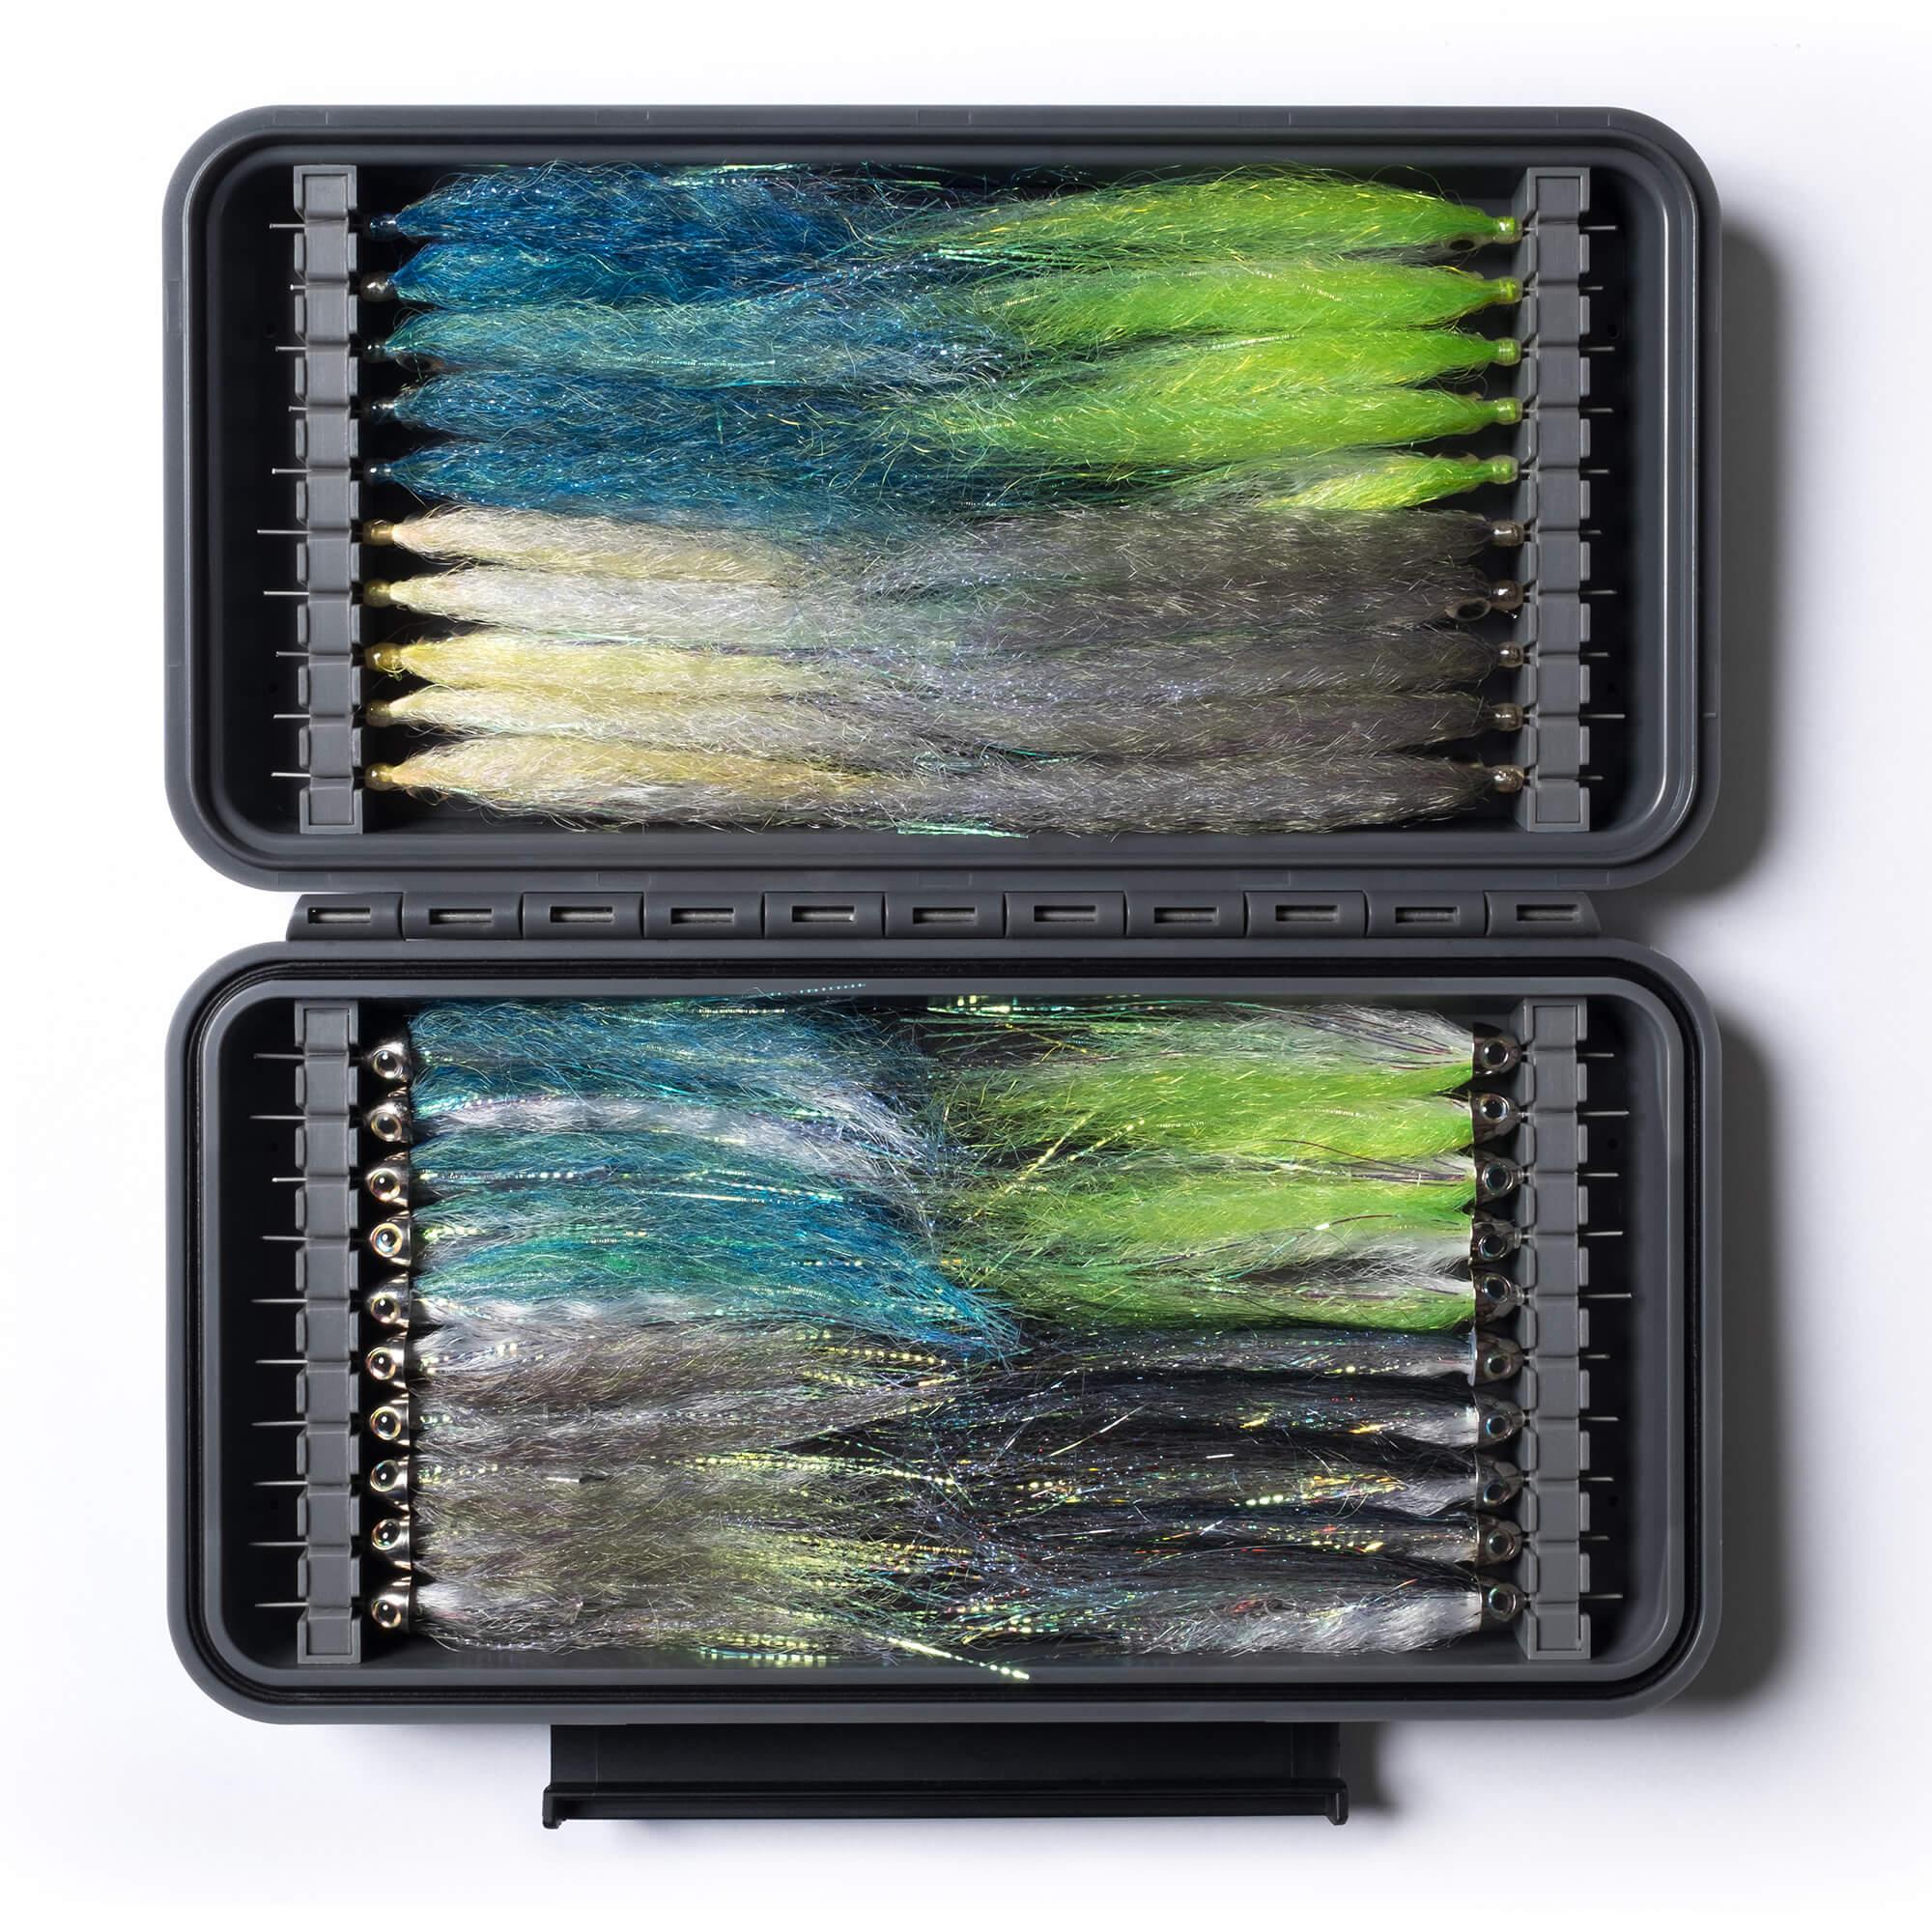 Loon Hot Box Fly Box GREAT NEW FISHING